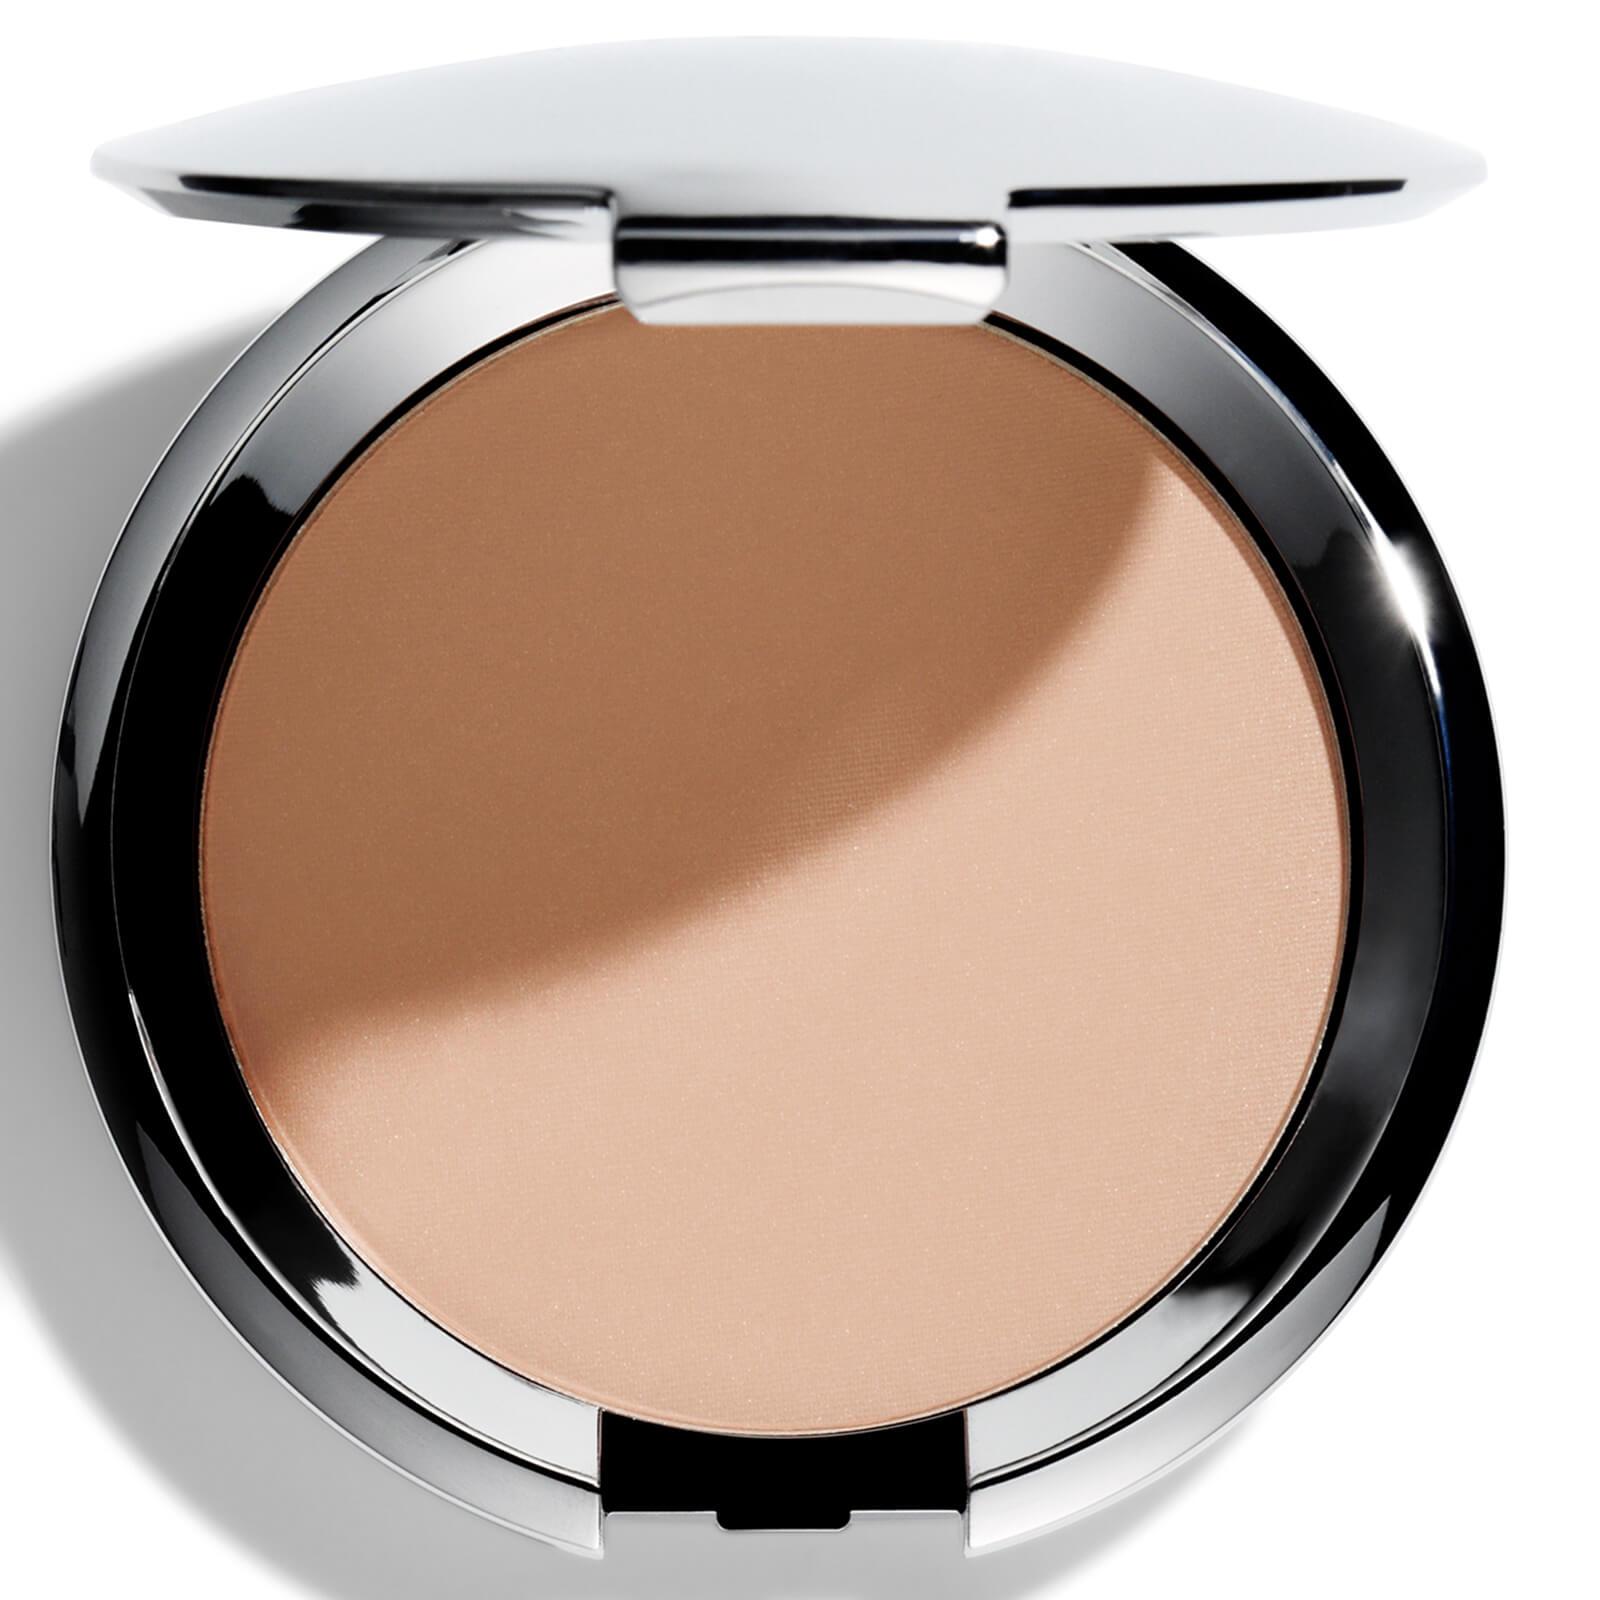 Chantecaille Fond de teint compact Chantecaille avec applicateur - Peach